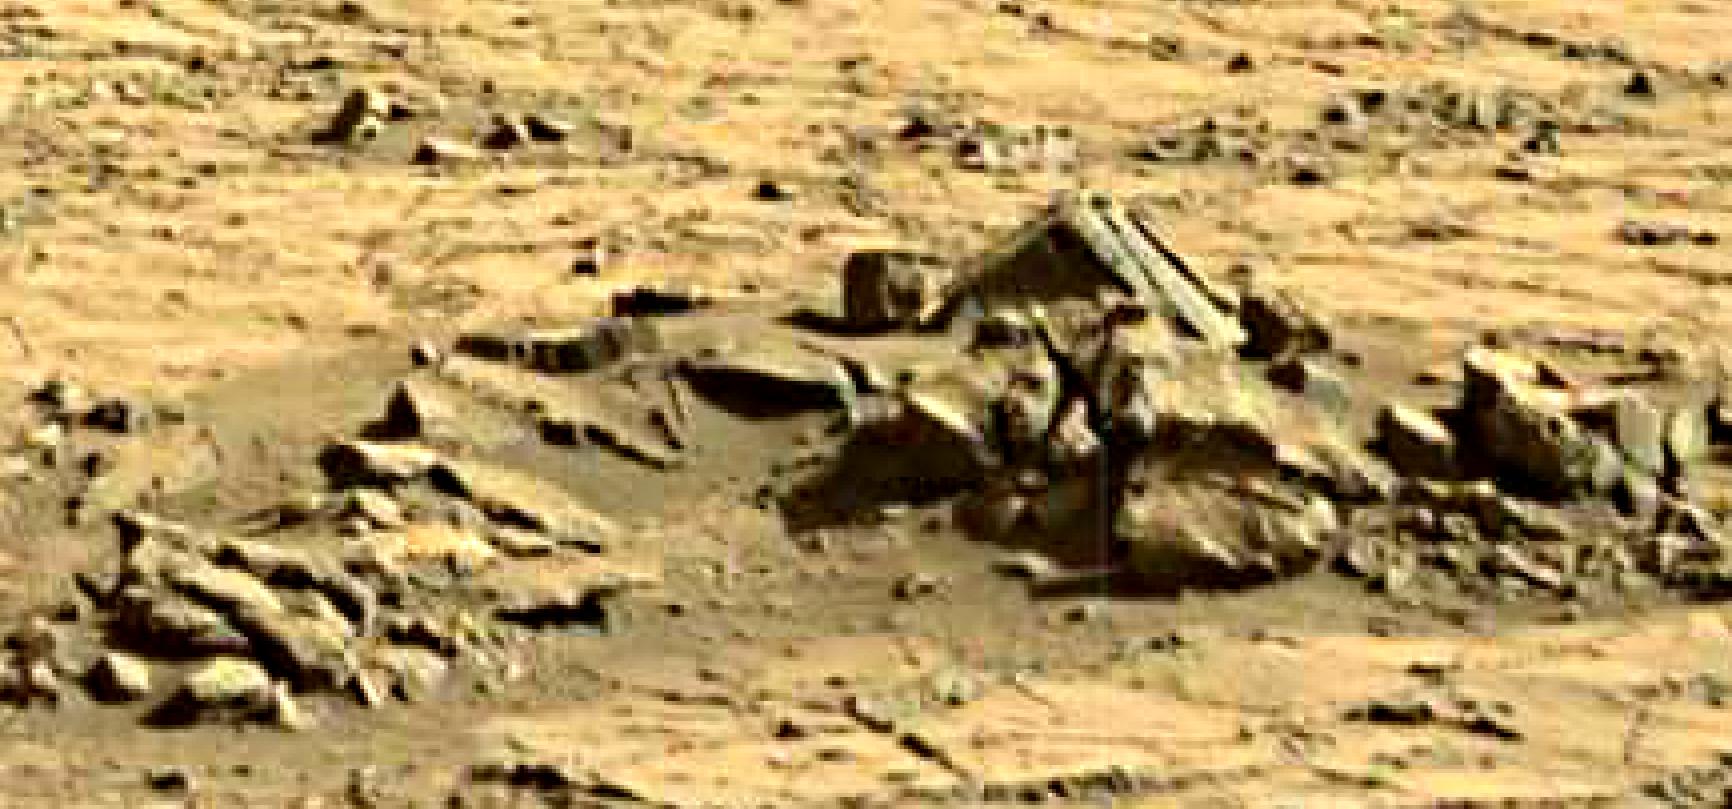 Mars Sol 1267 Curiosity – 1267ML0059330010504322E01 | Was ...